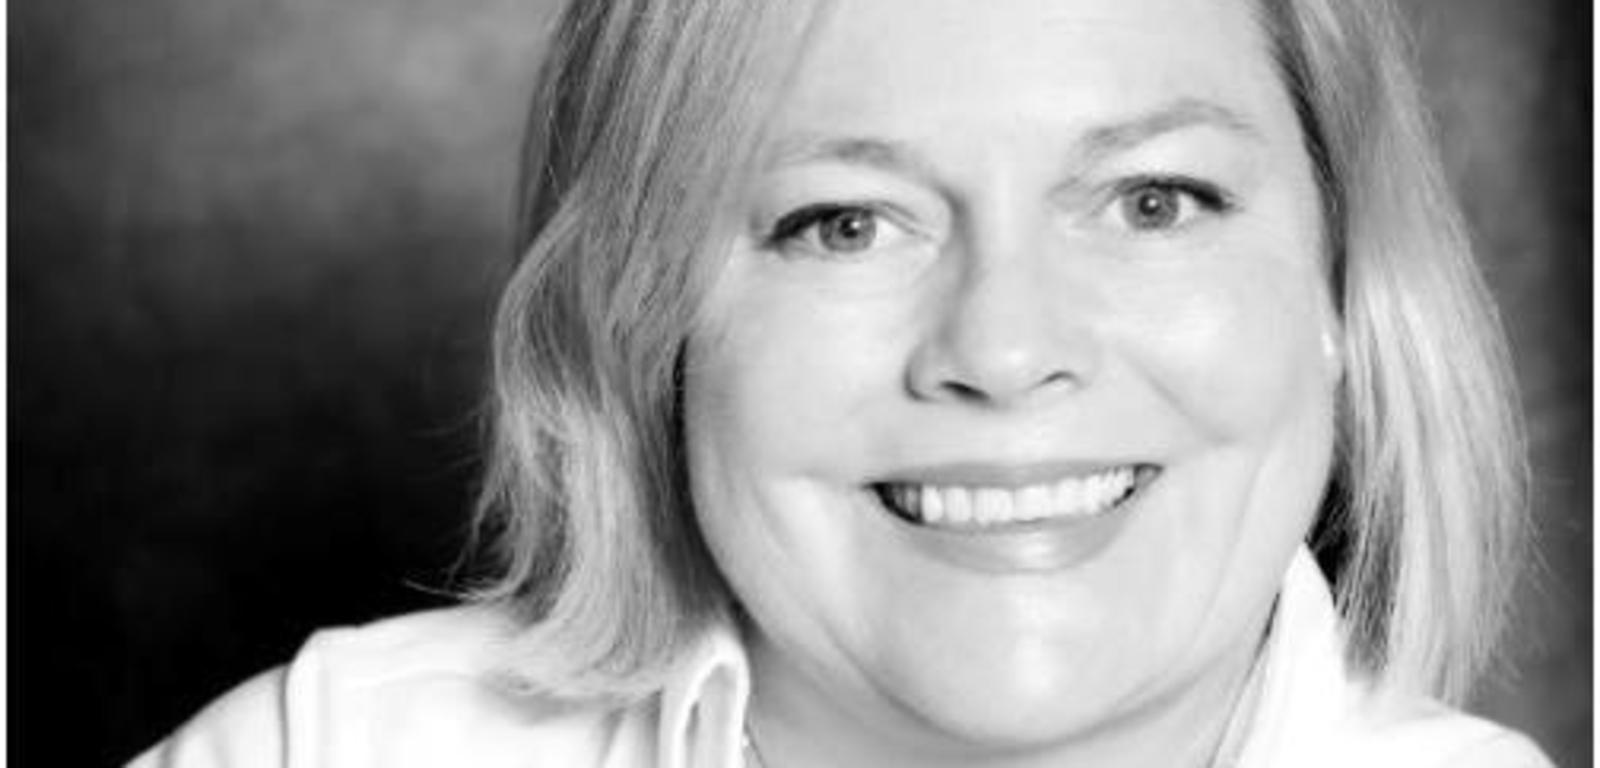 PMS Partner Spotlight: A conversation with Barefoot executive Claiborne Yarbrough